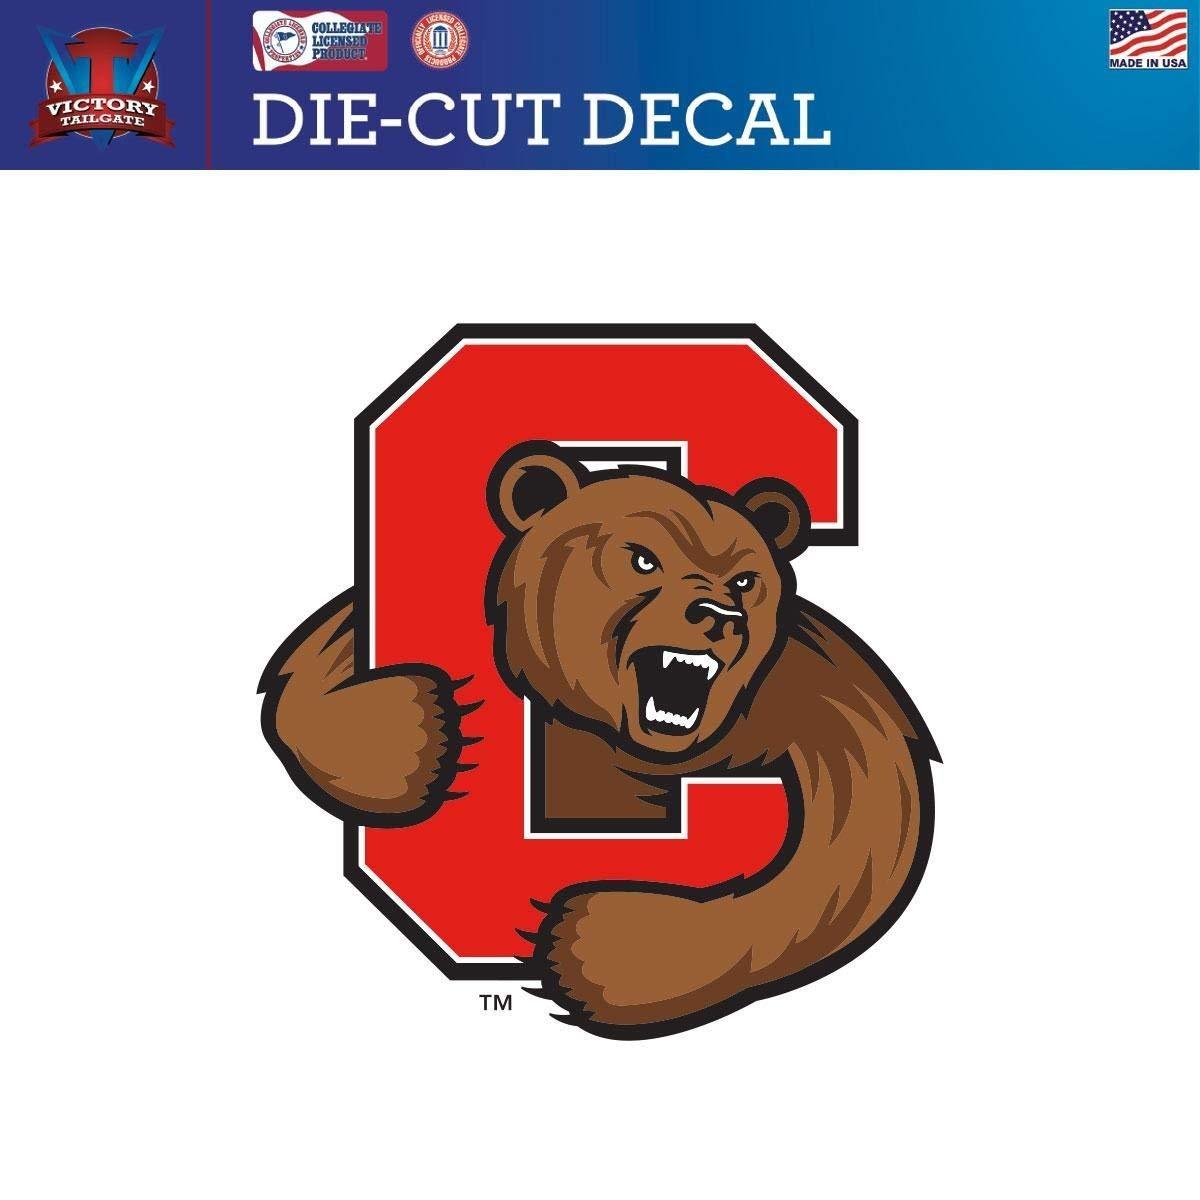 Victory Tailgate Cornell University Big Red Die-Cut Vinyl Decal